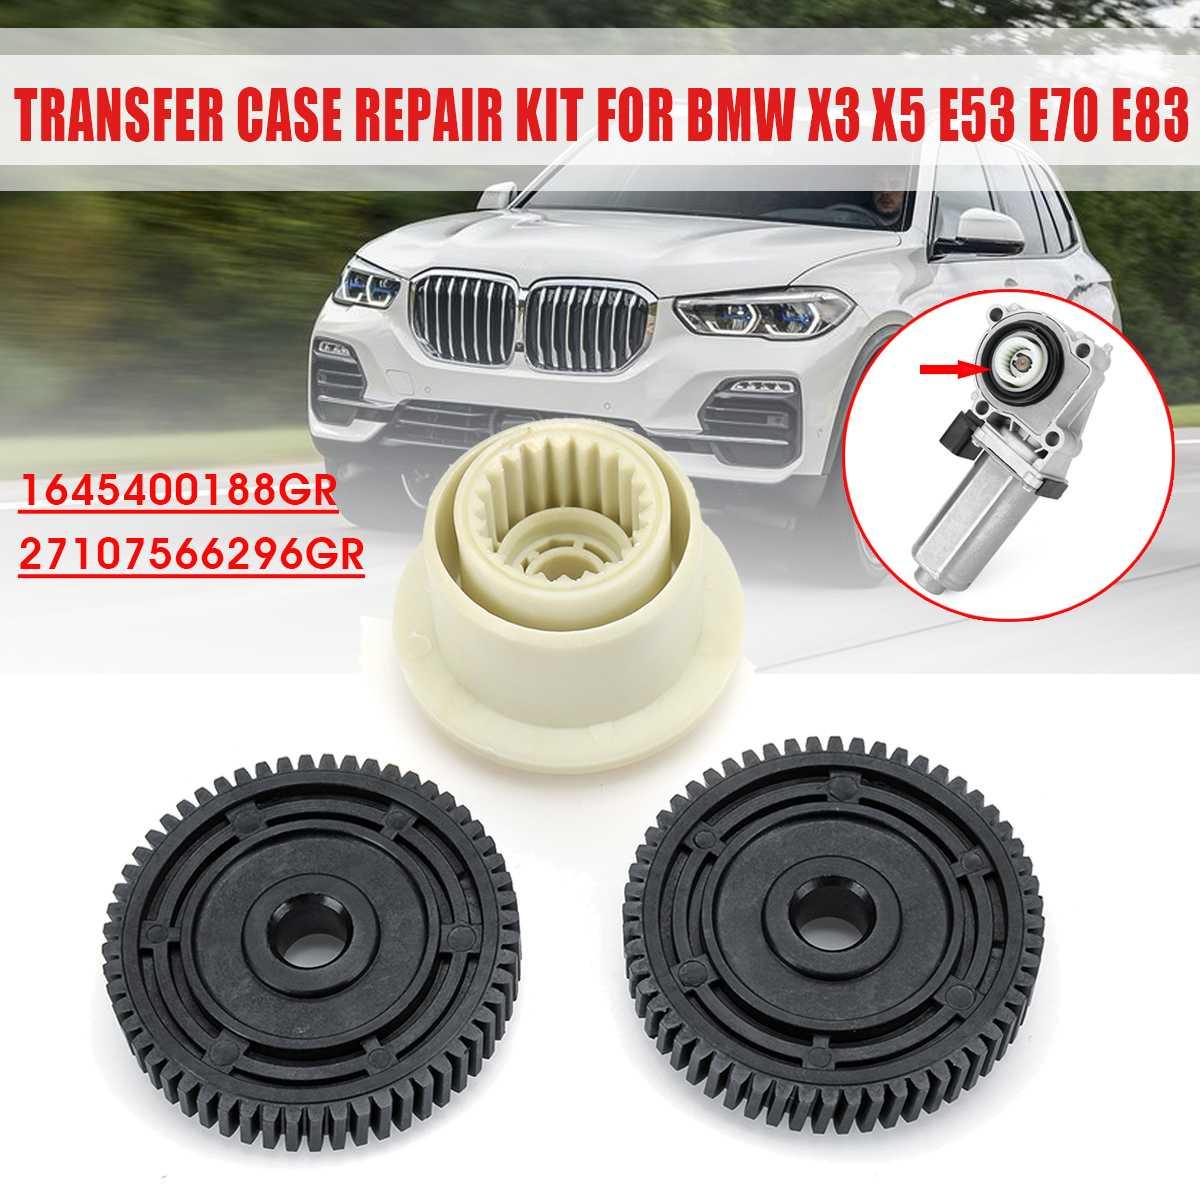 3cs Auto Getriebe Box Transfer Fall Servo Antrieb Motor Reparatur 27107566296 Für BMW X3 X5 X6 E83 E53 E70 E71 2003-2010